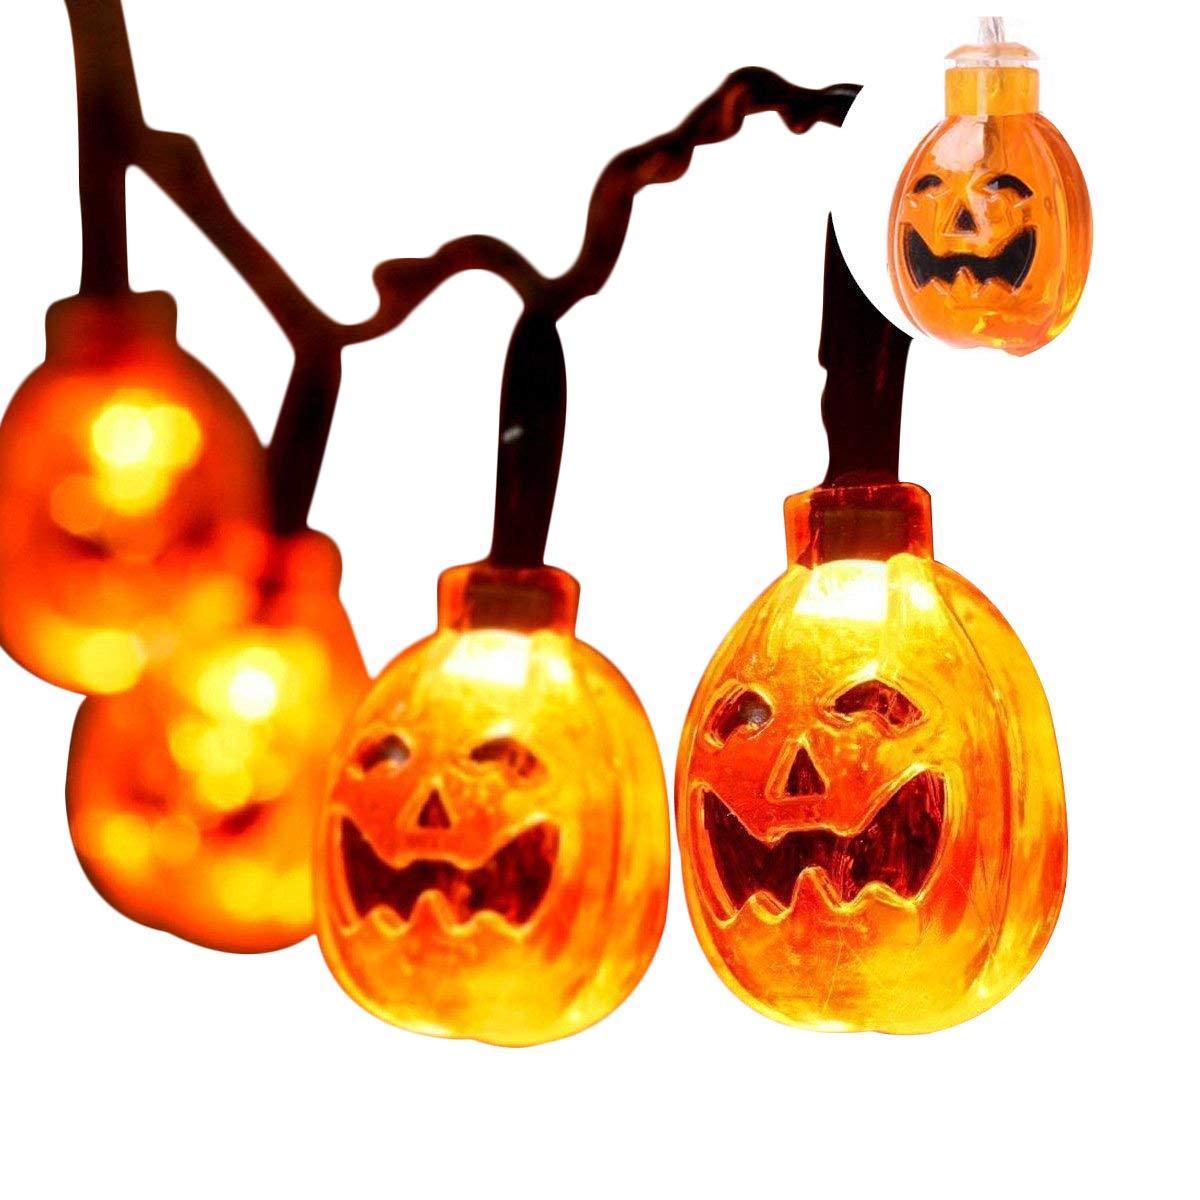 Lightter Pumpkin String Light, Halloween String Light with 20 LED Lights 16ft-2 Modes Battery Operated, 3D Jack-O-Lantern String Light for Outdoor,Home,Patio,Garden Deco, Warm White